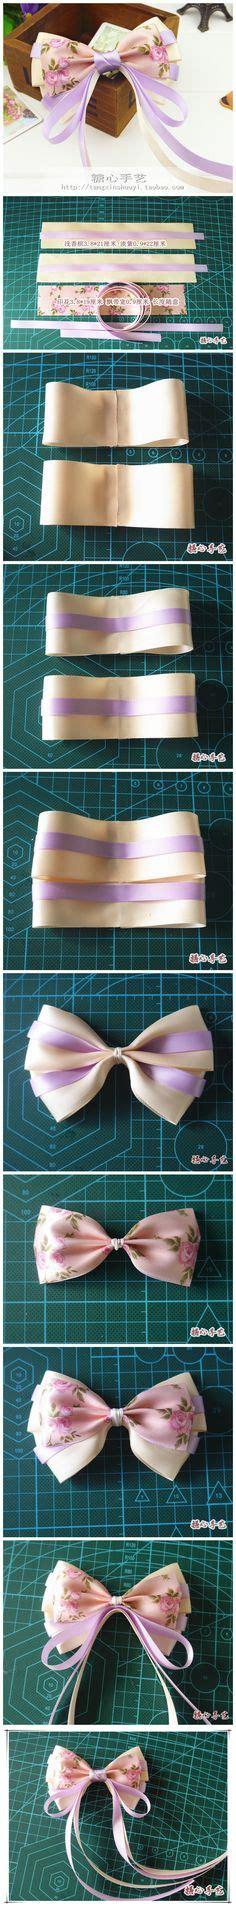 Pita Yellow Headband T2909 handmade baby toddler stretchy elastic headband hair band kanzashi fabric flower bumble